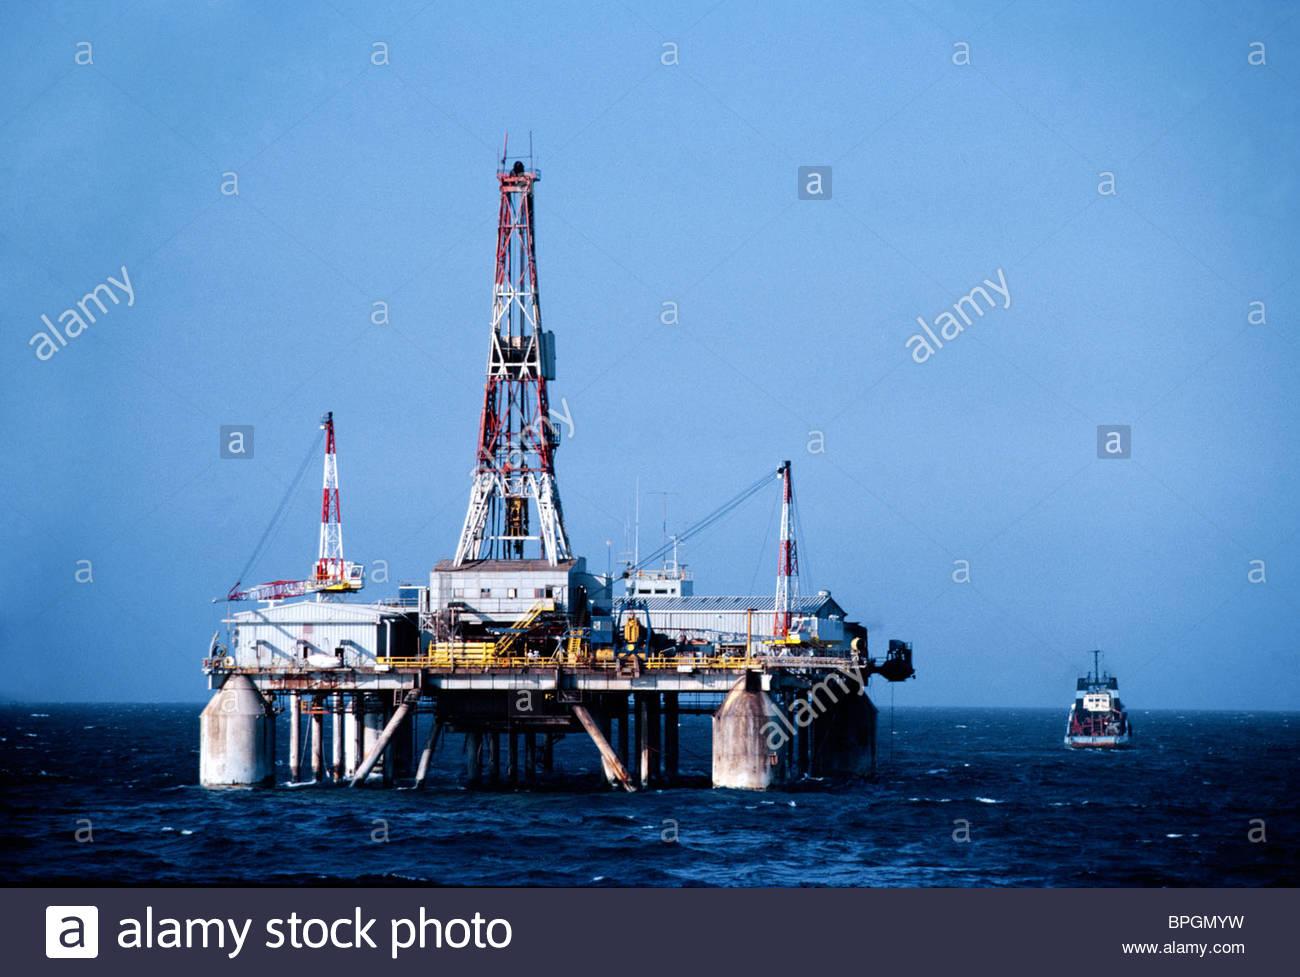 Oil Nigeria Oil Platform At Sea - Stock Image